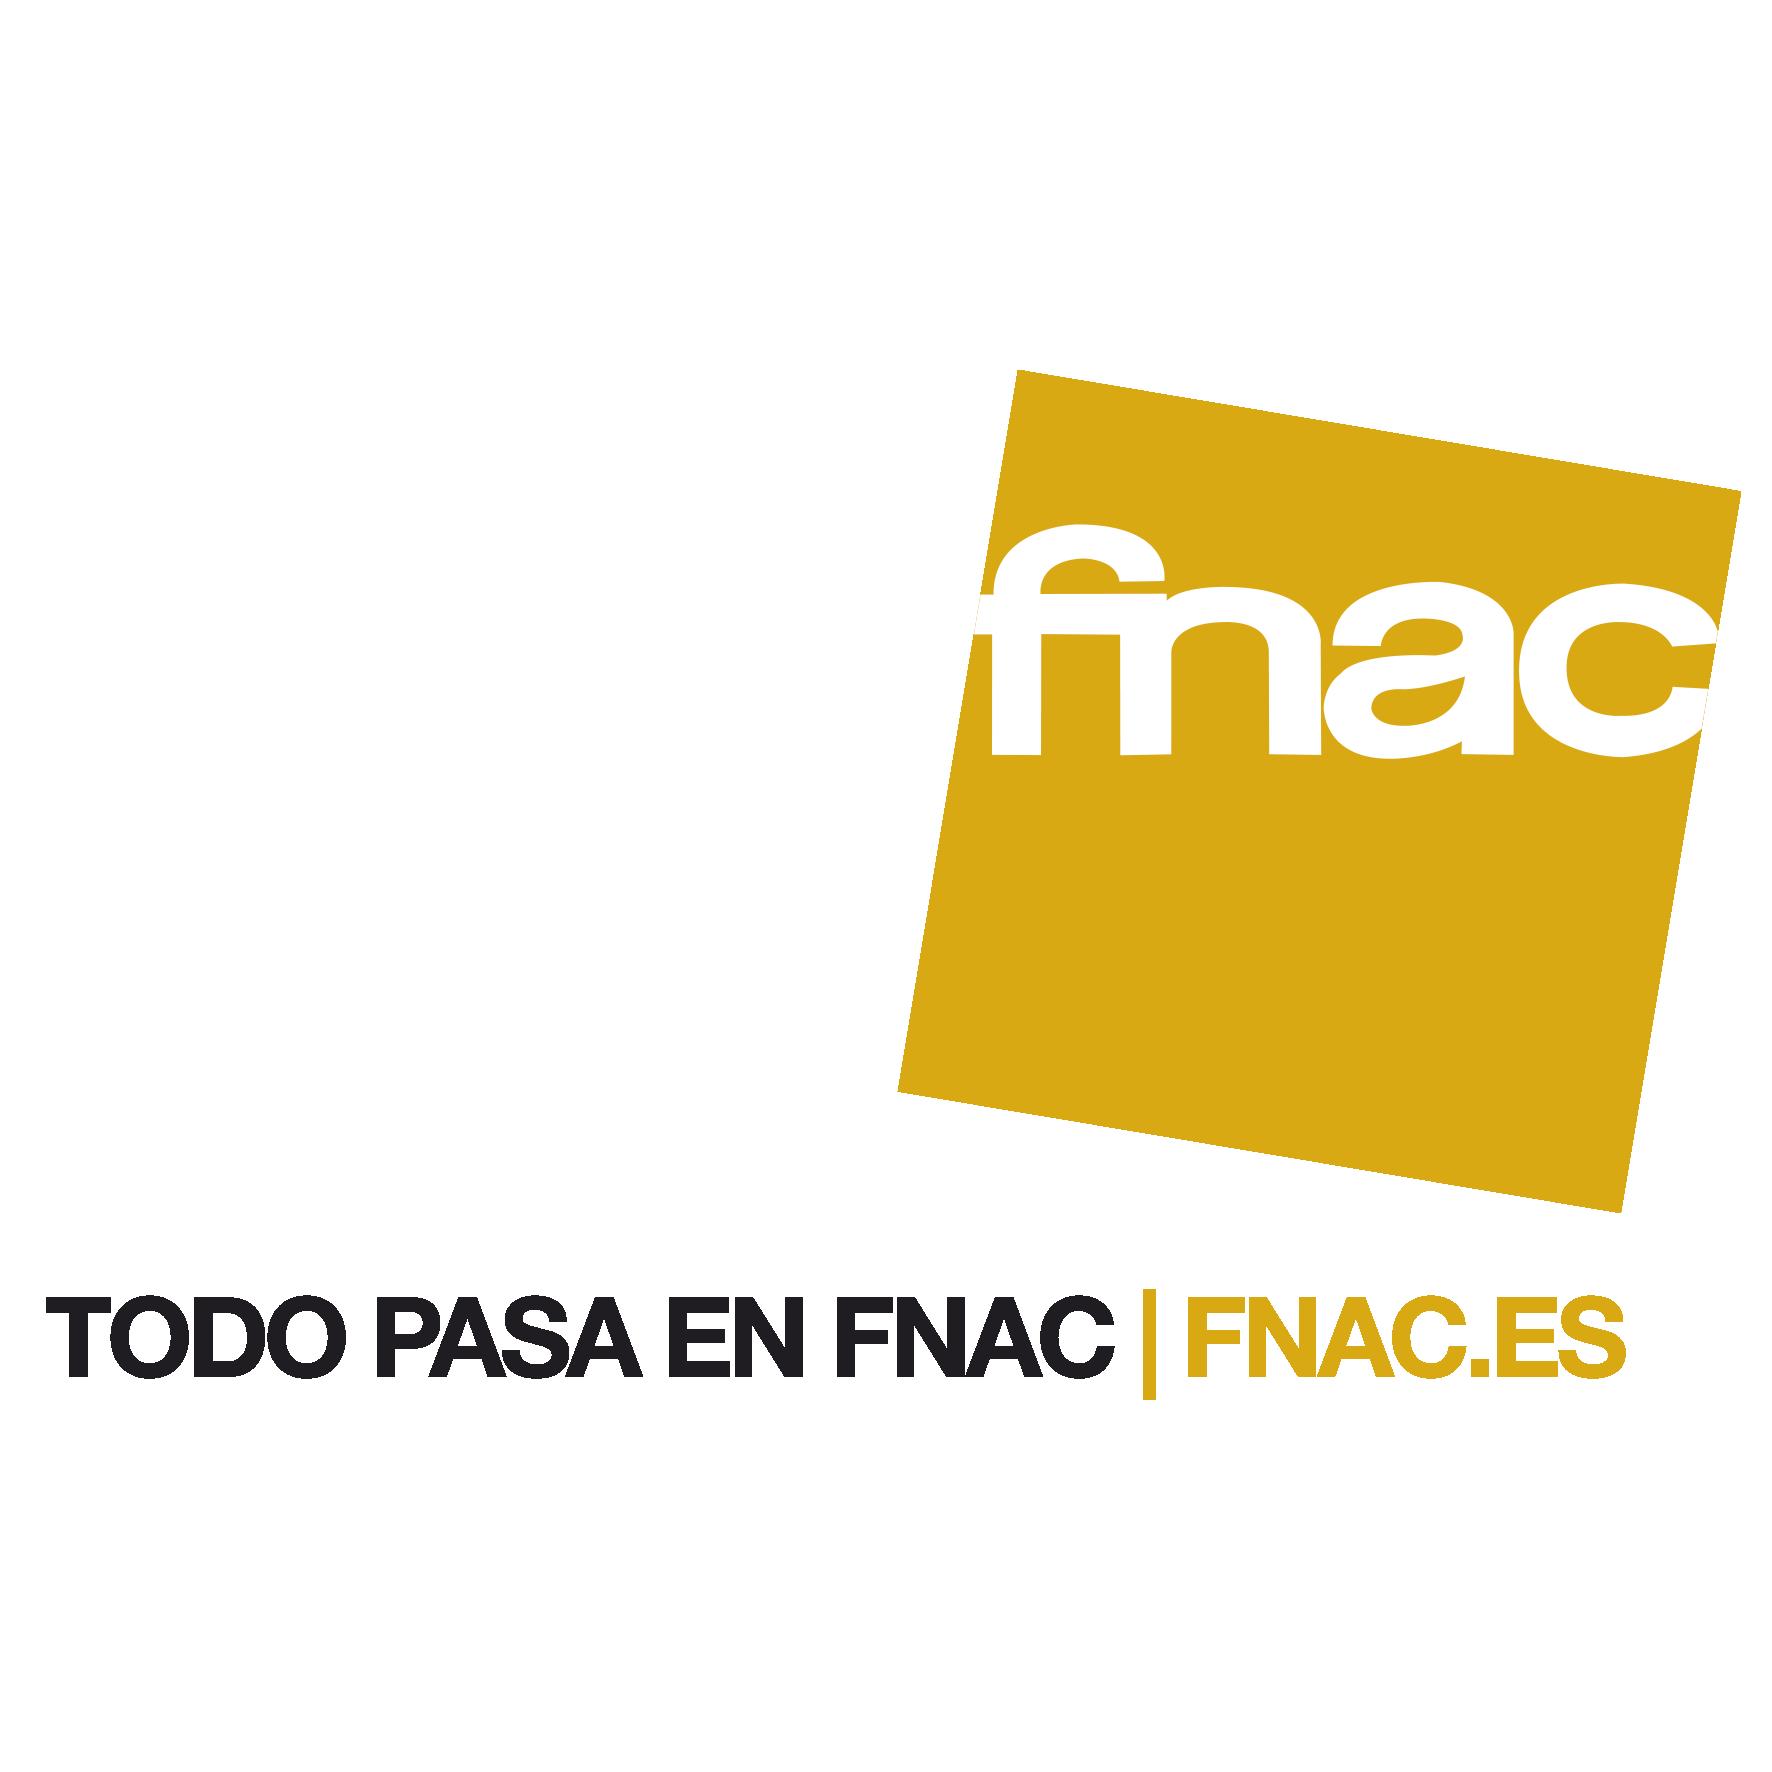 fnaclogo.png